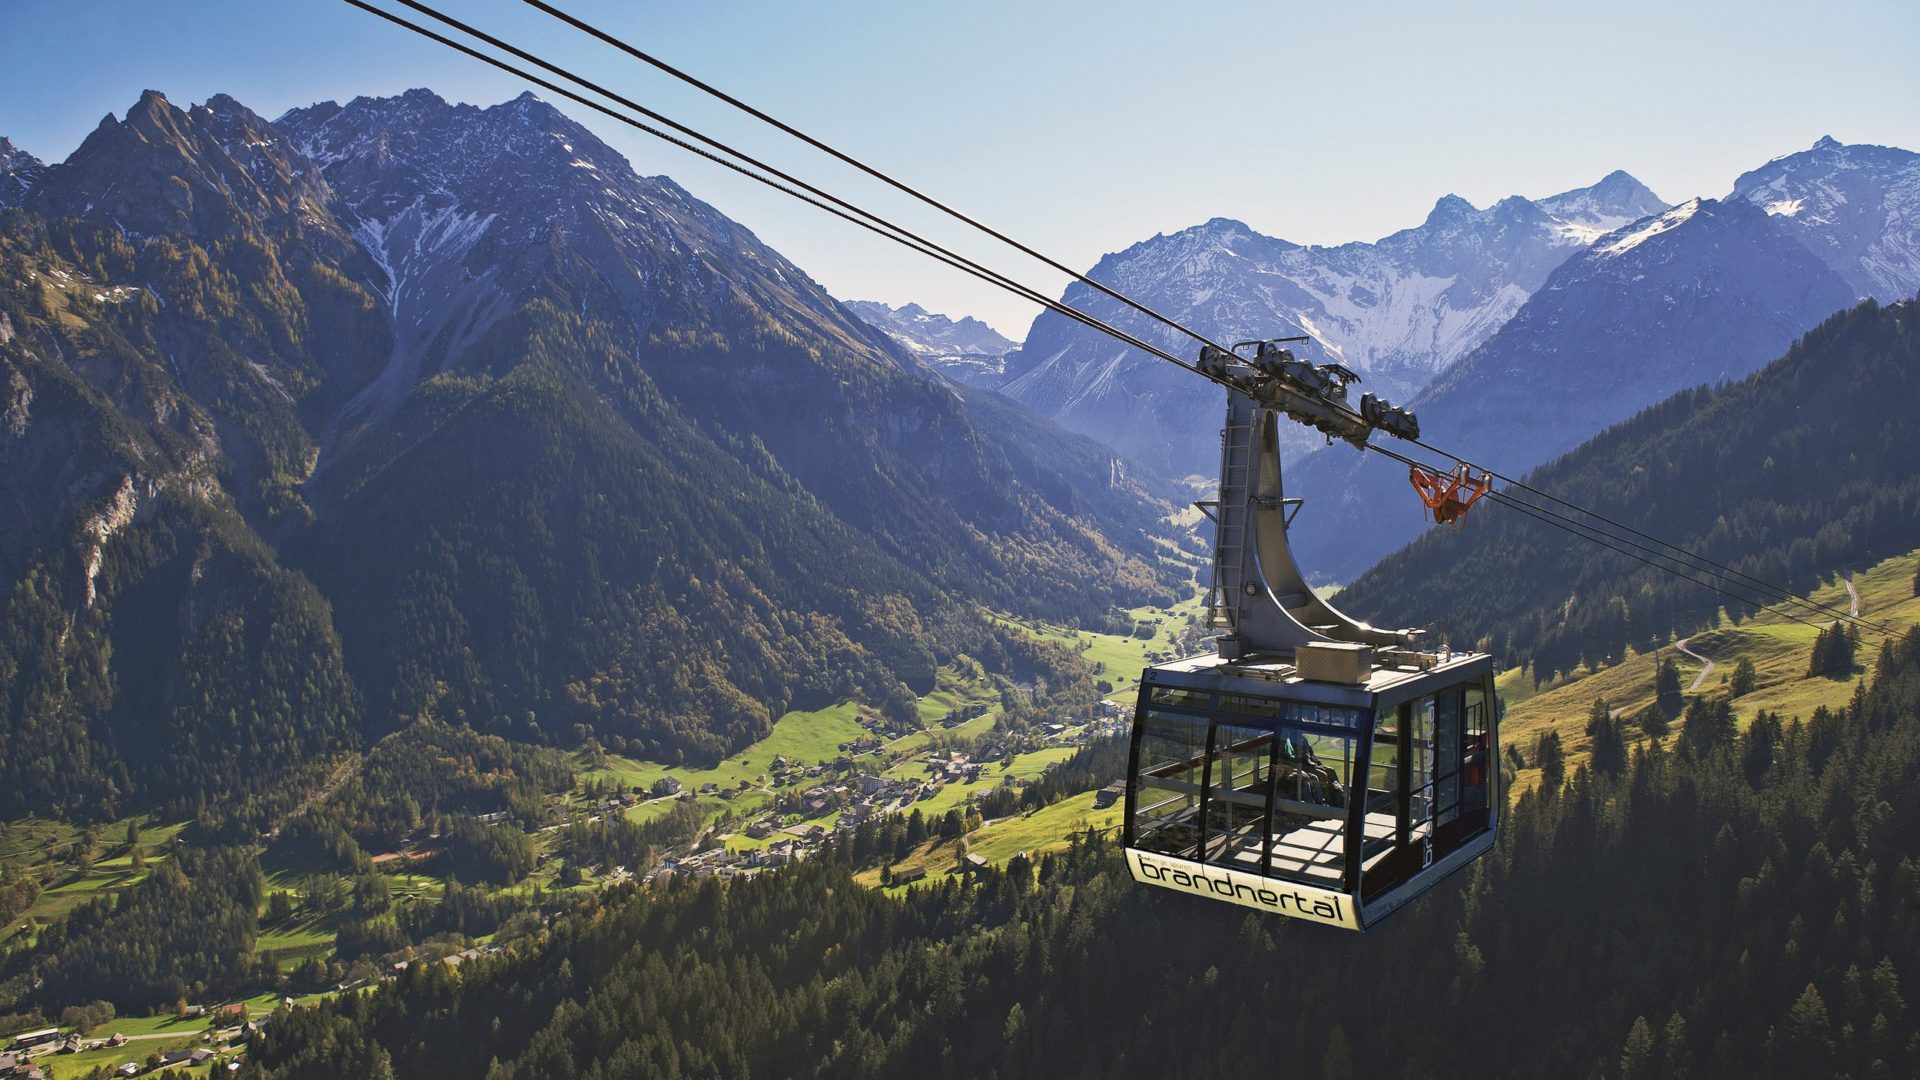 Panoramabahn Brandnertal im Sommer © Bergbahnen Brandnertal GesmbH